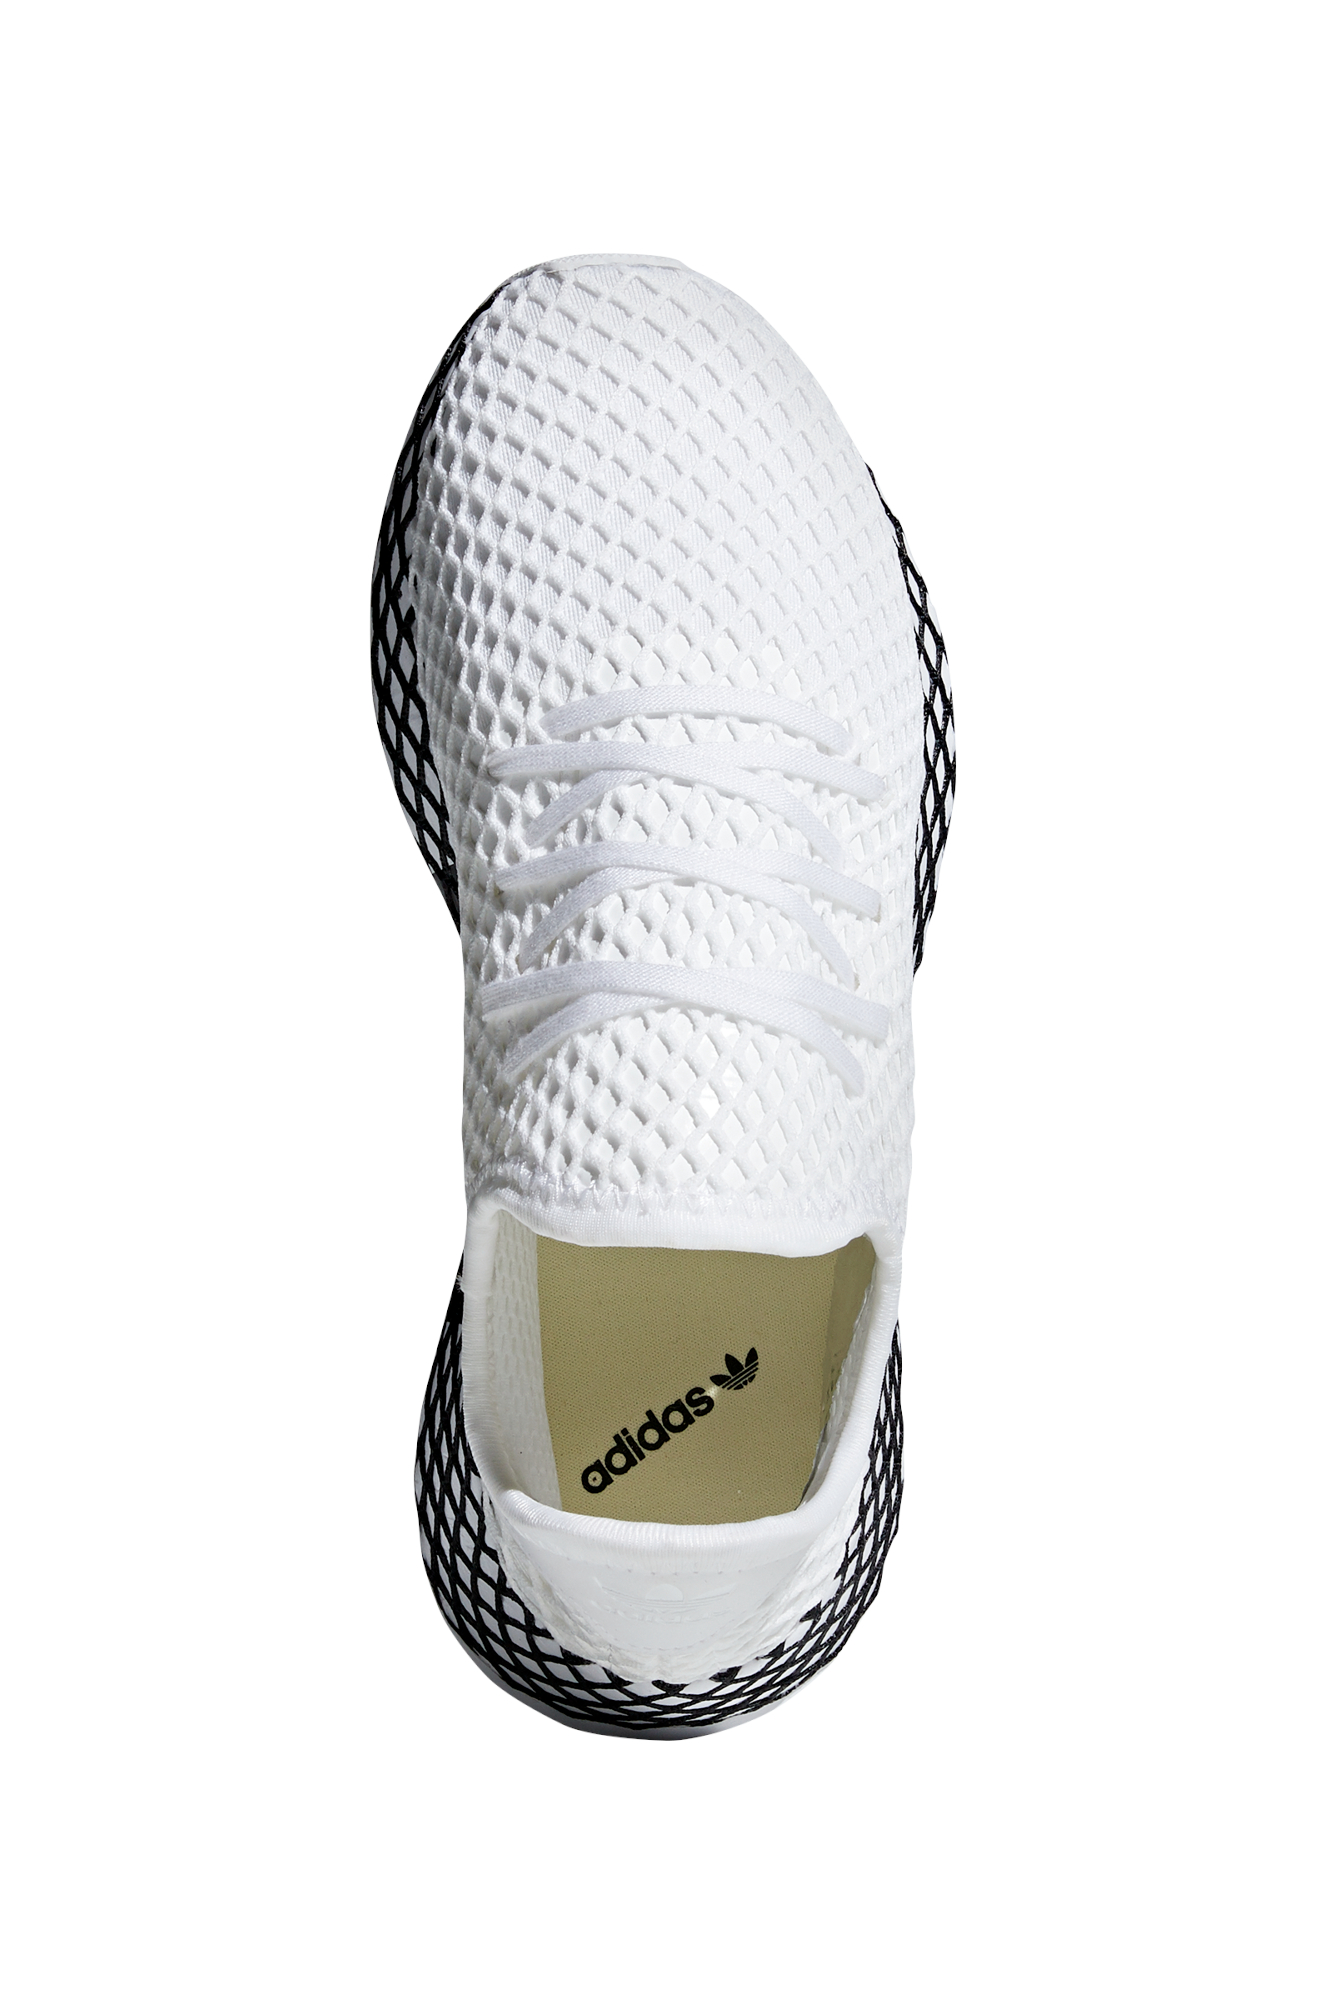 cheaper 01240 f2152 ... Buty adidas Originals Deerupt Runner - AQ1790 ...